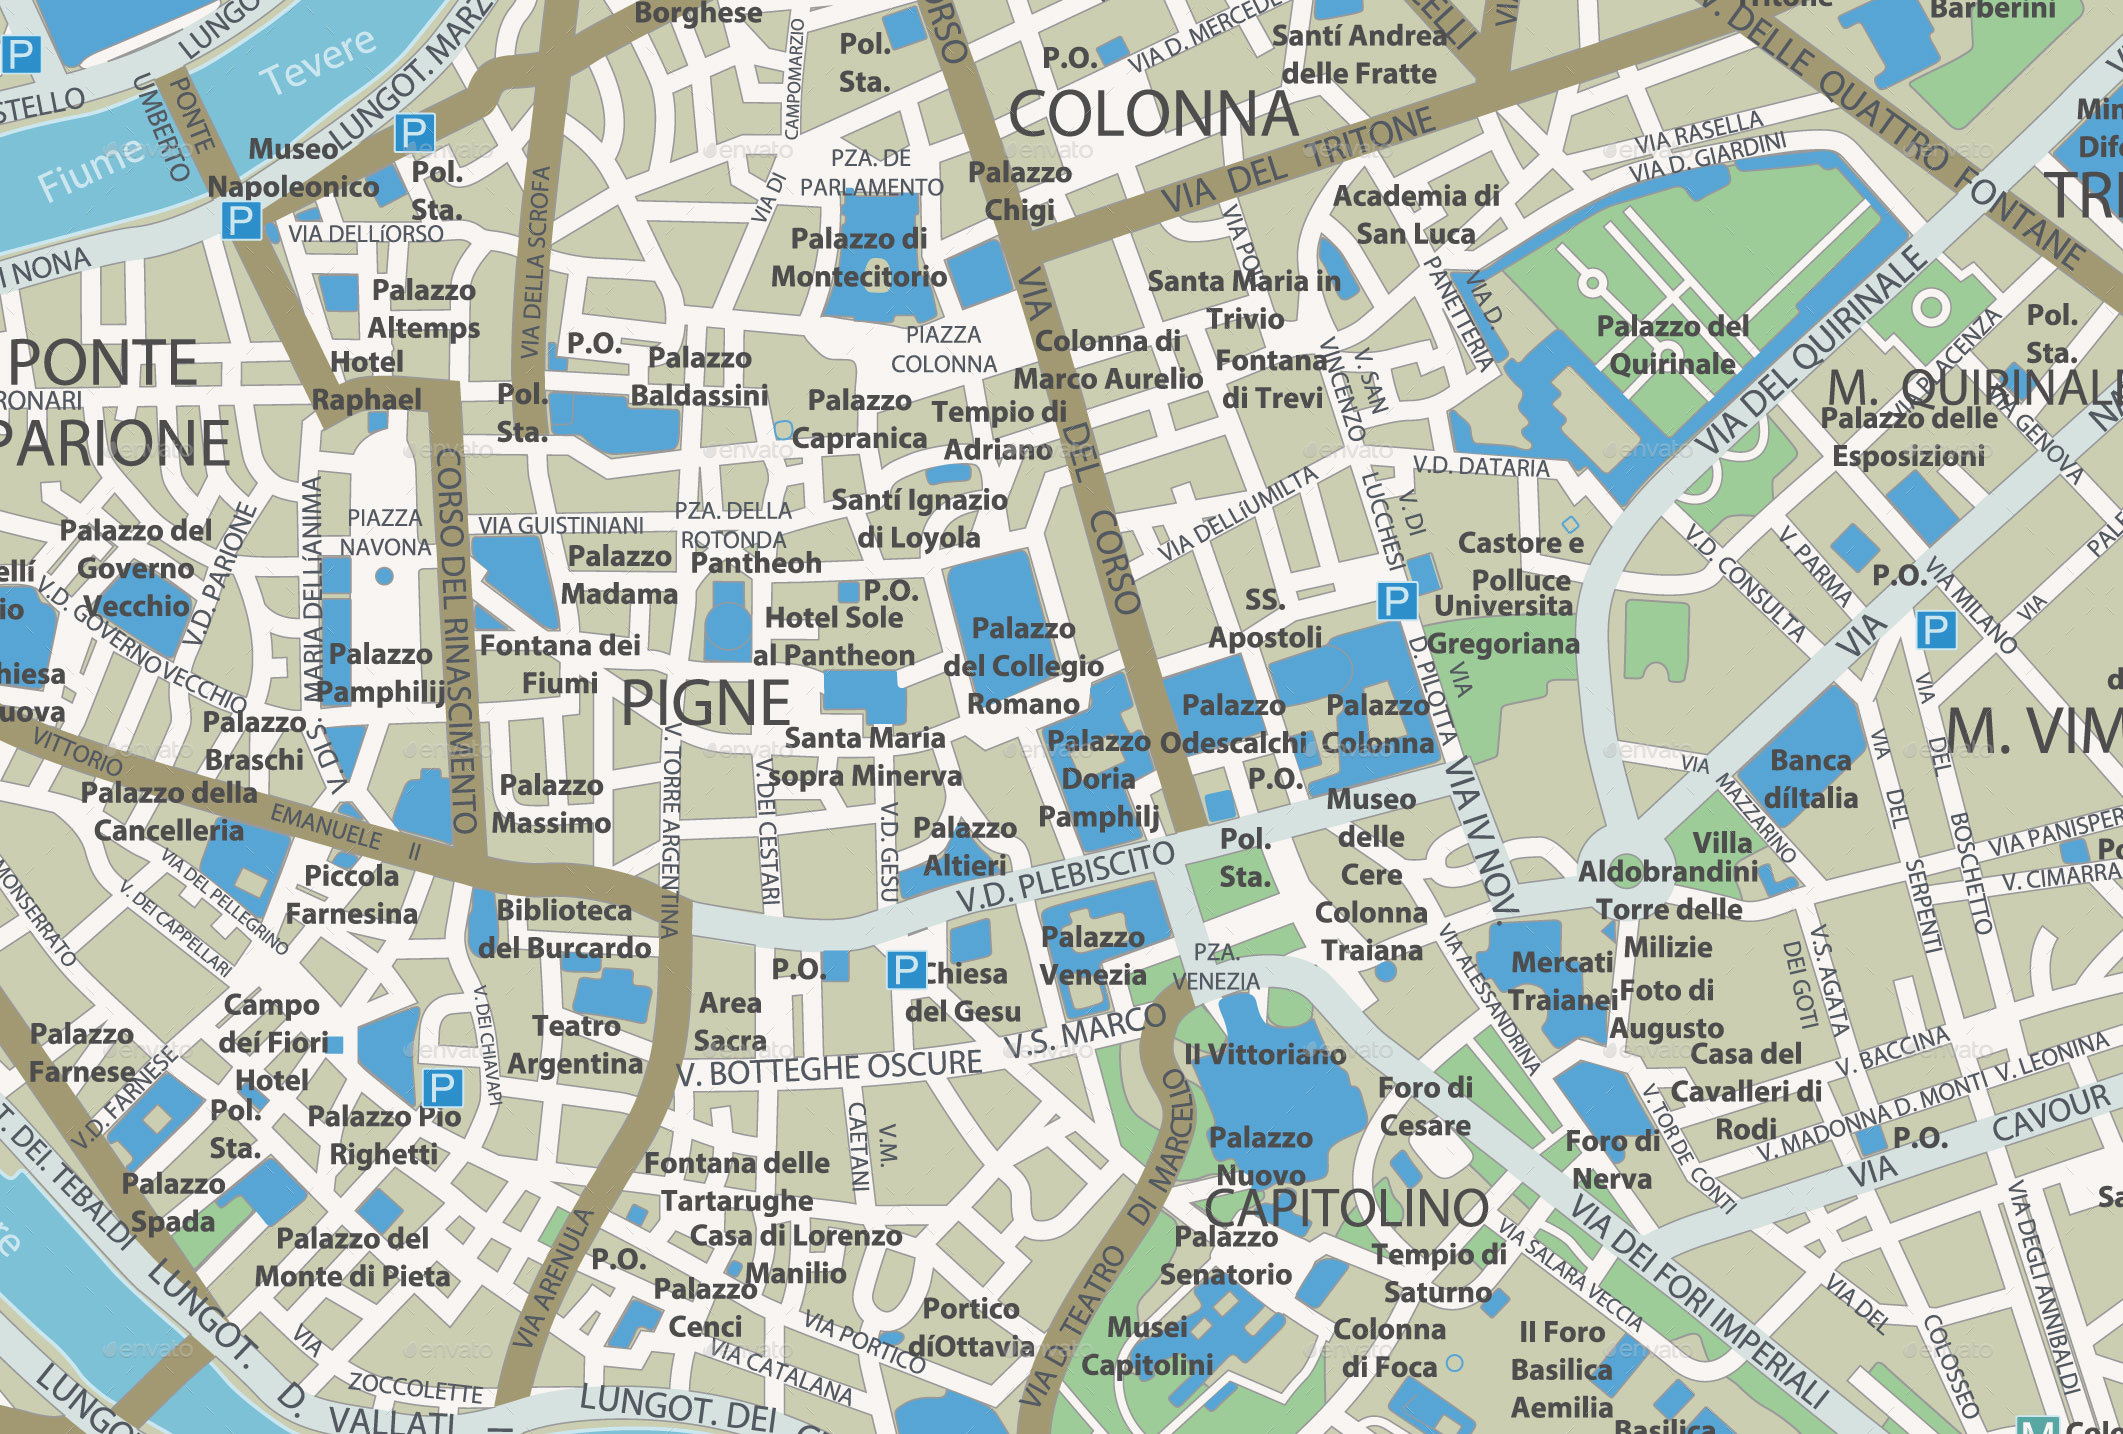 Rome City Map by Cartarium | GraphicRiver